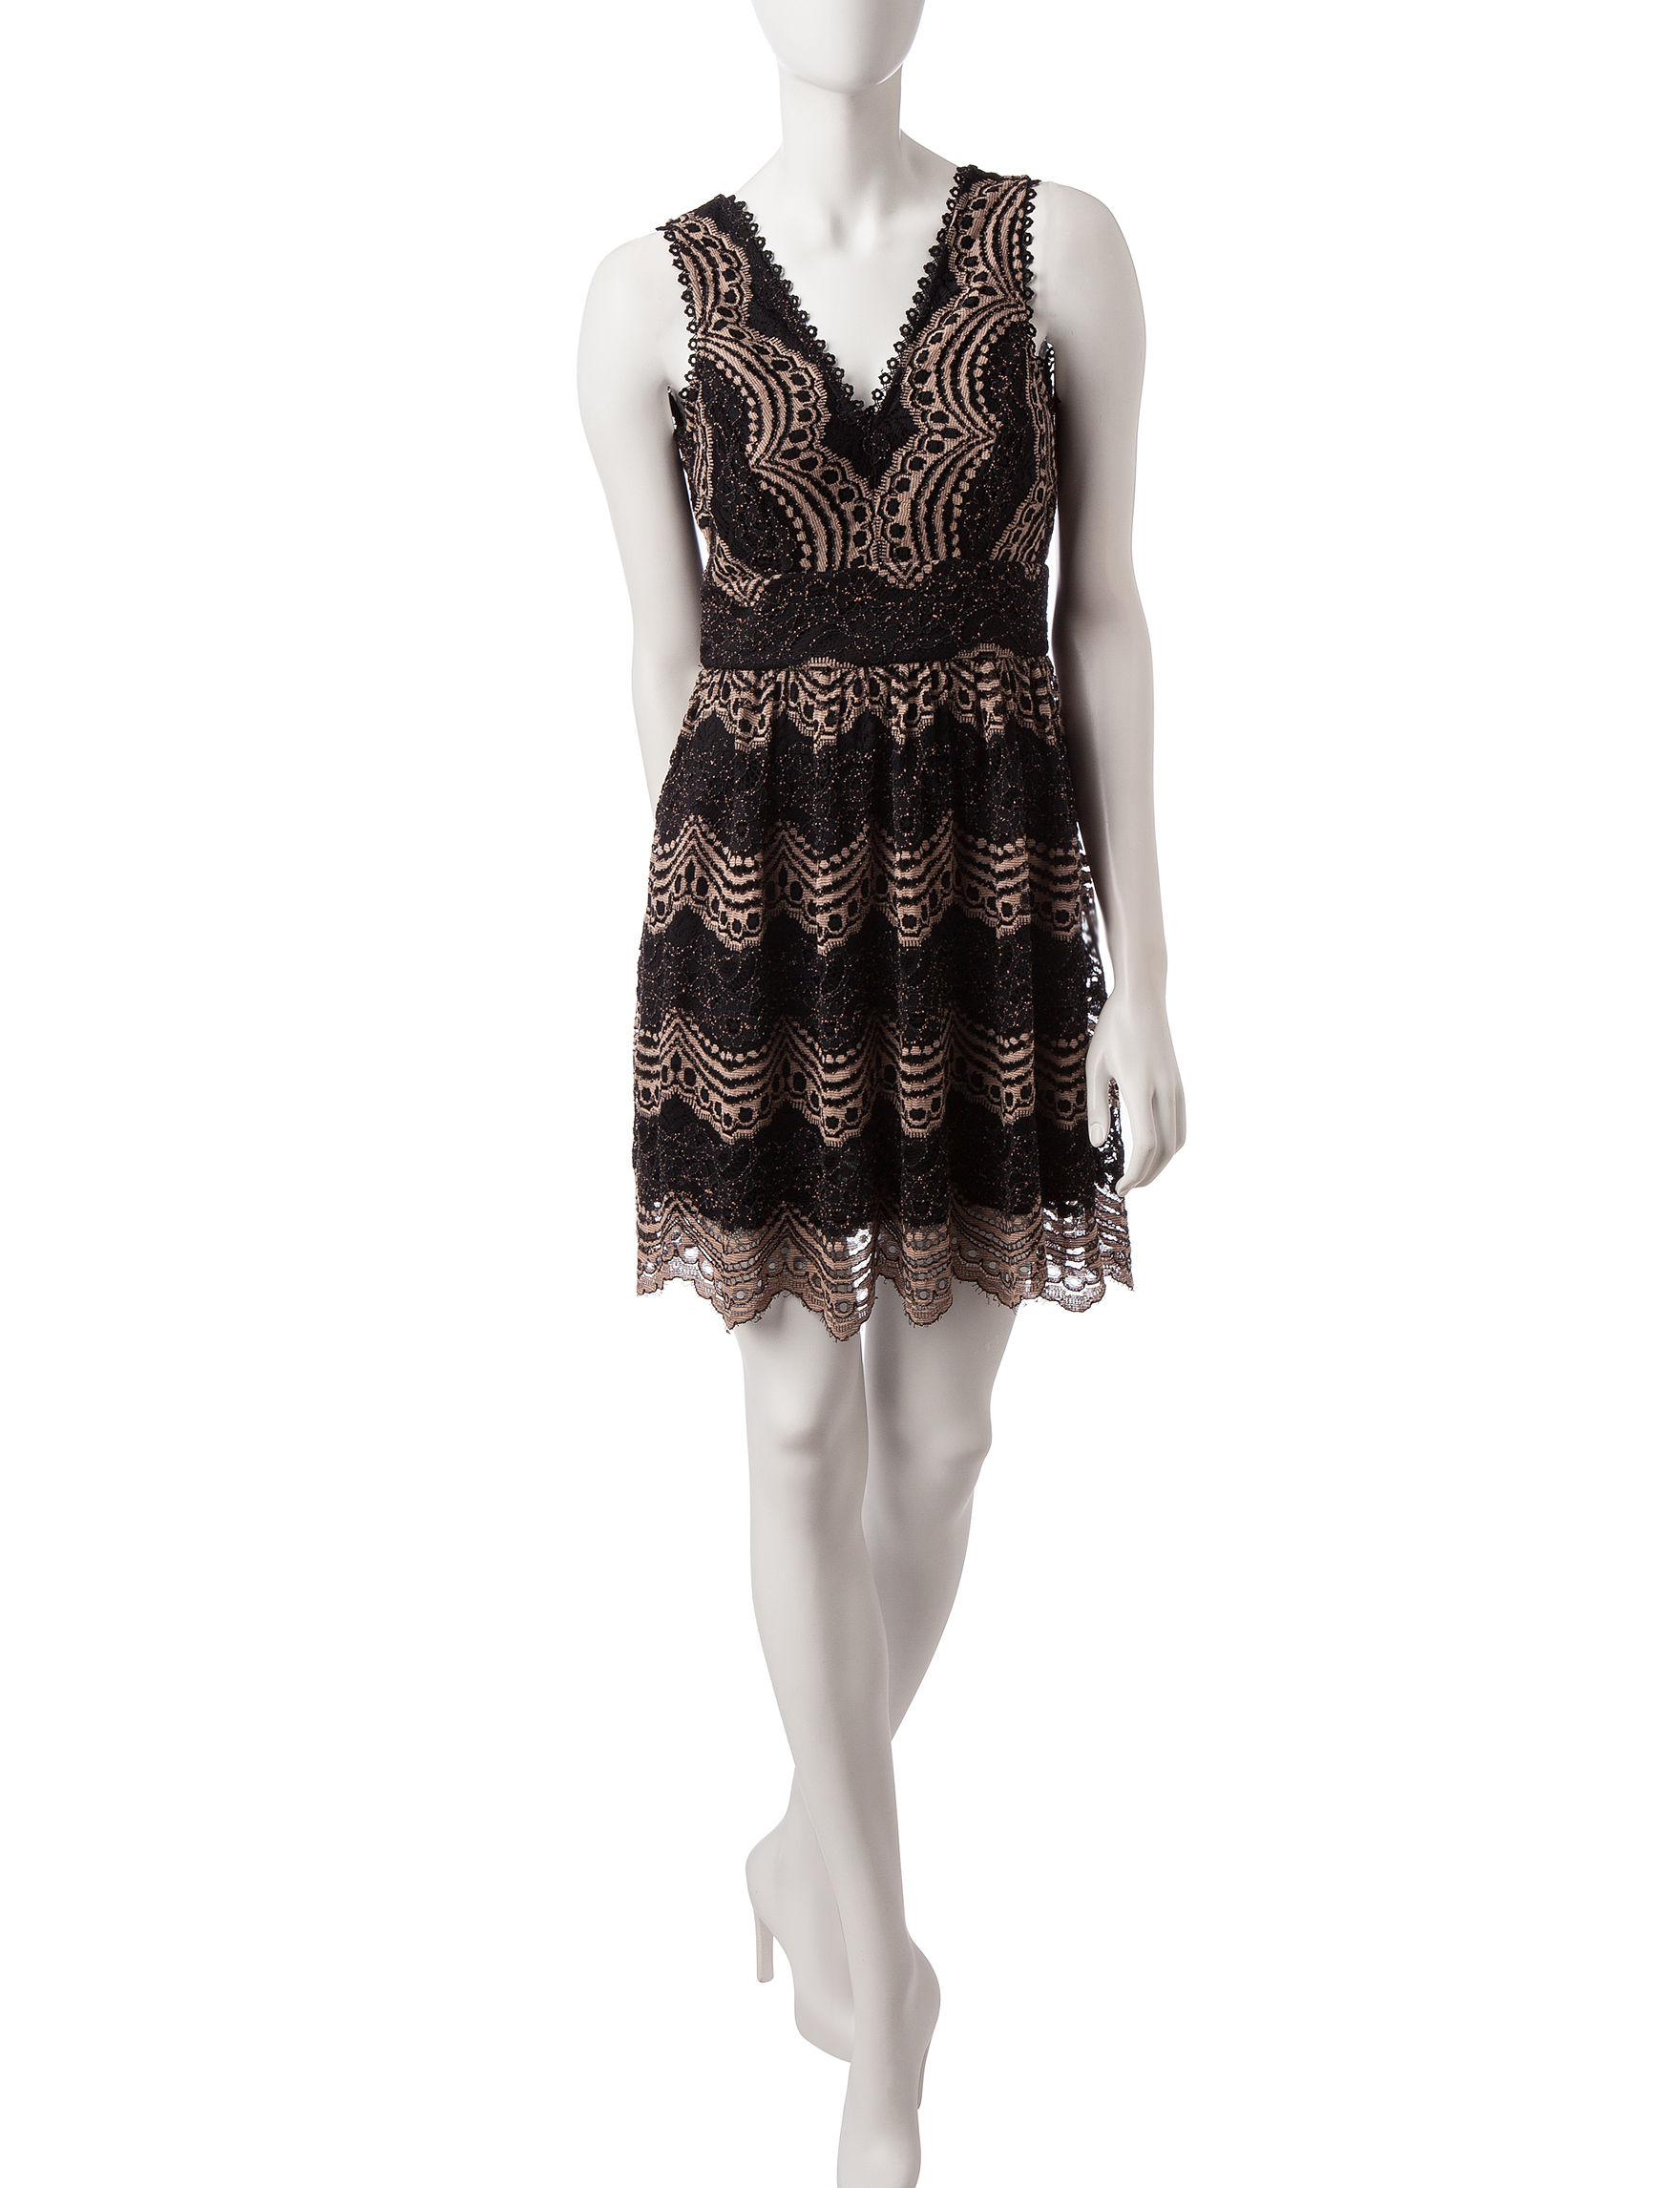 Trixxi Black Cocktail & Party Fit & Flare Dresses